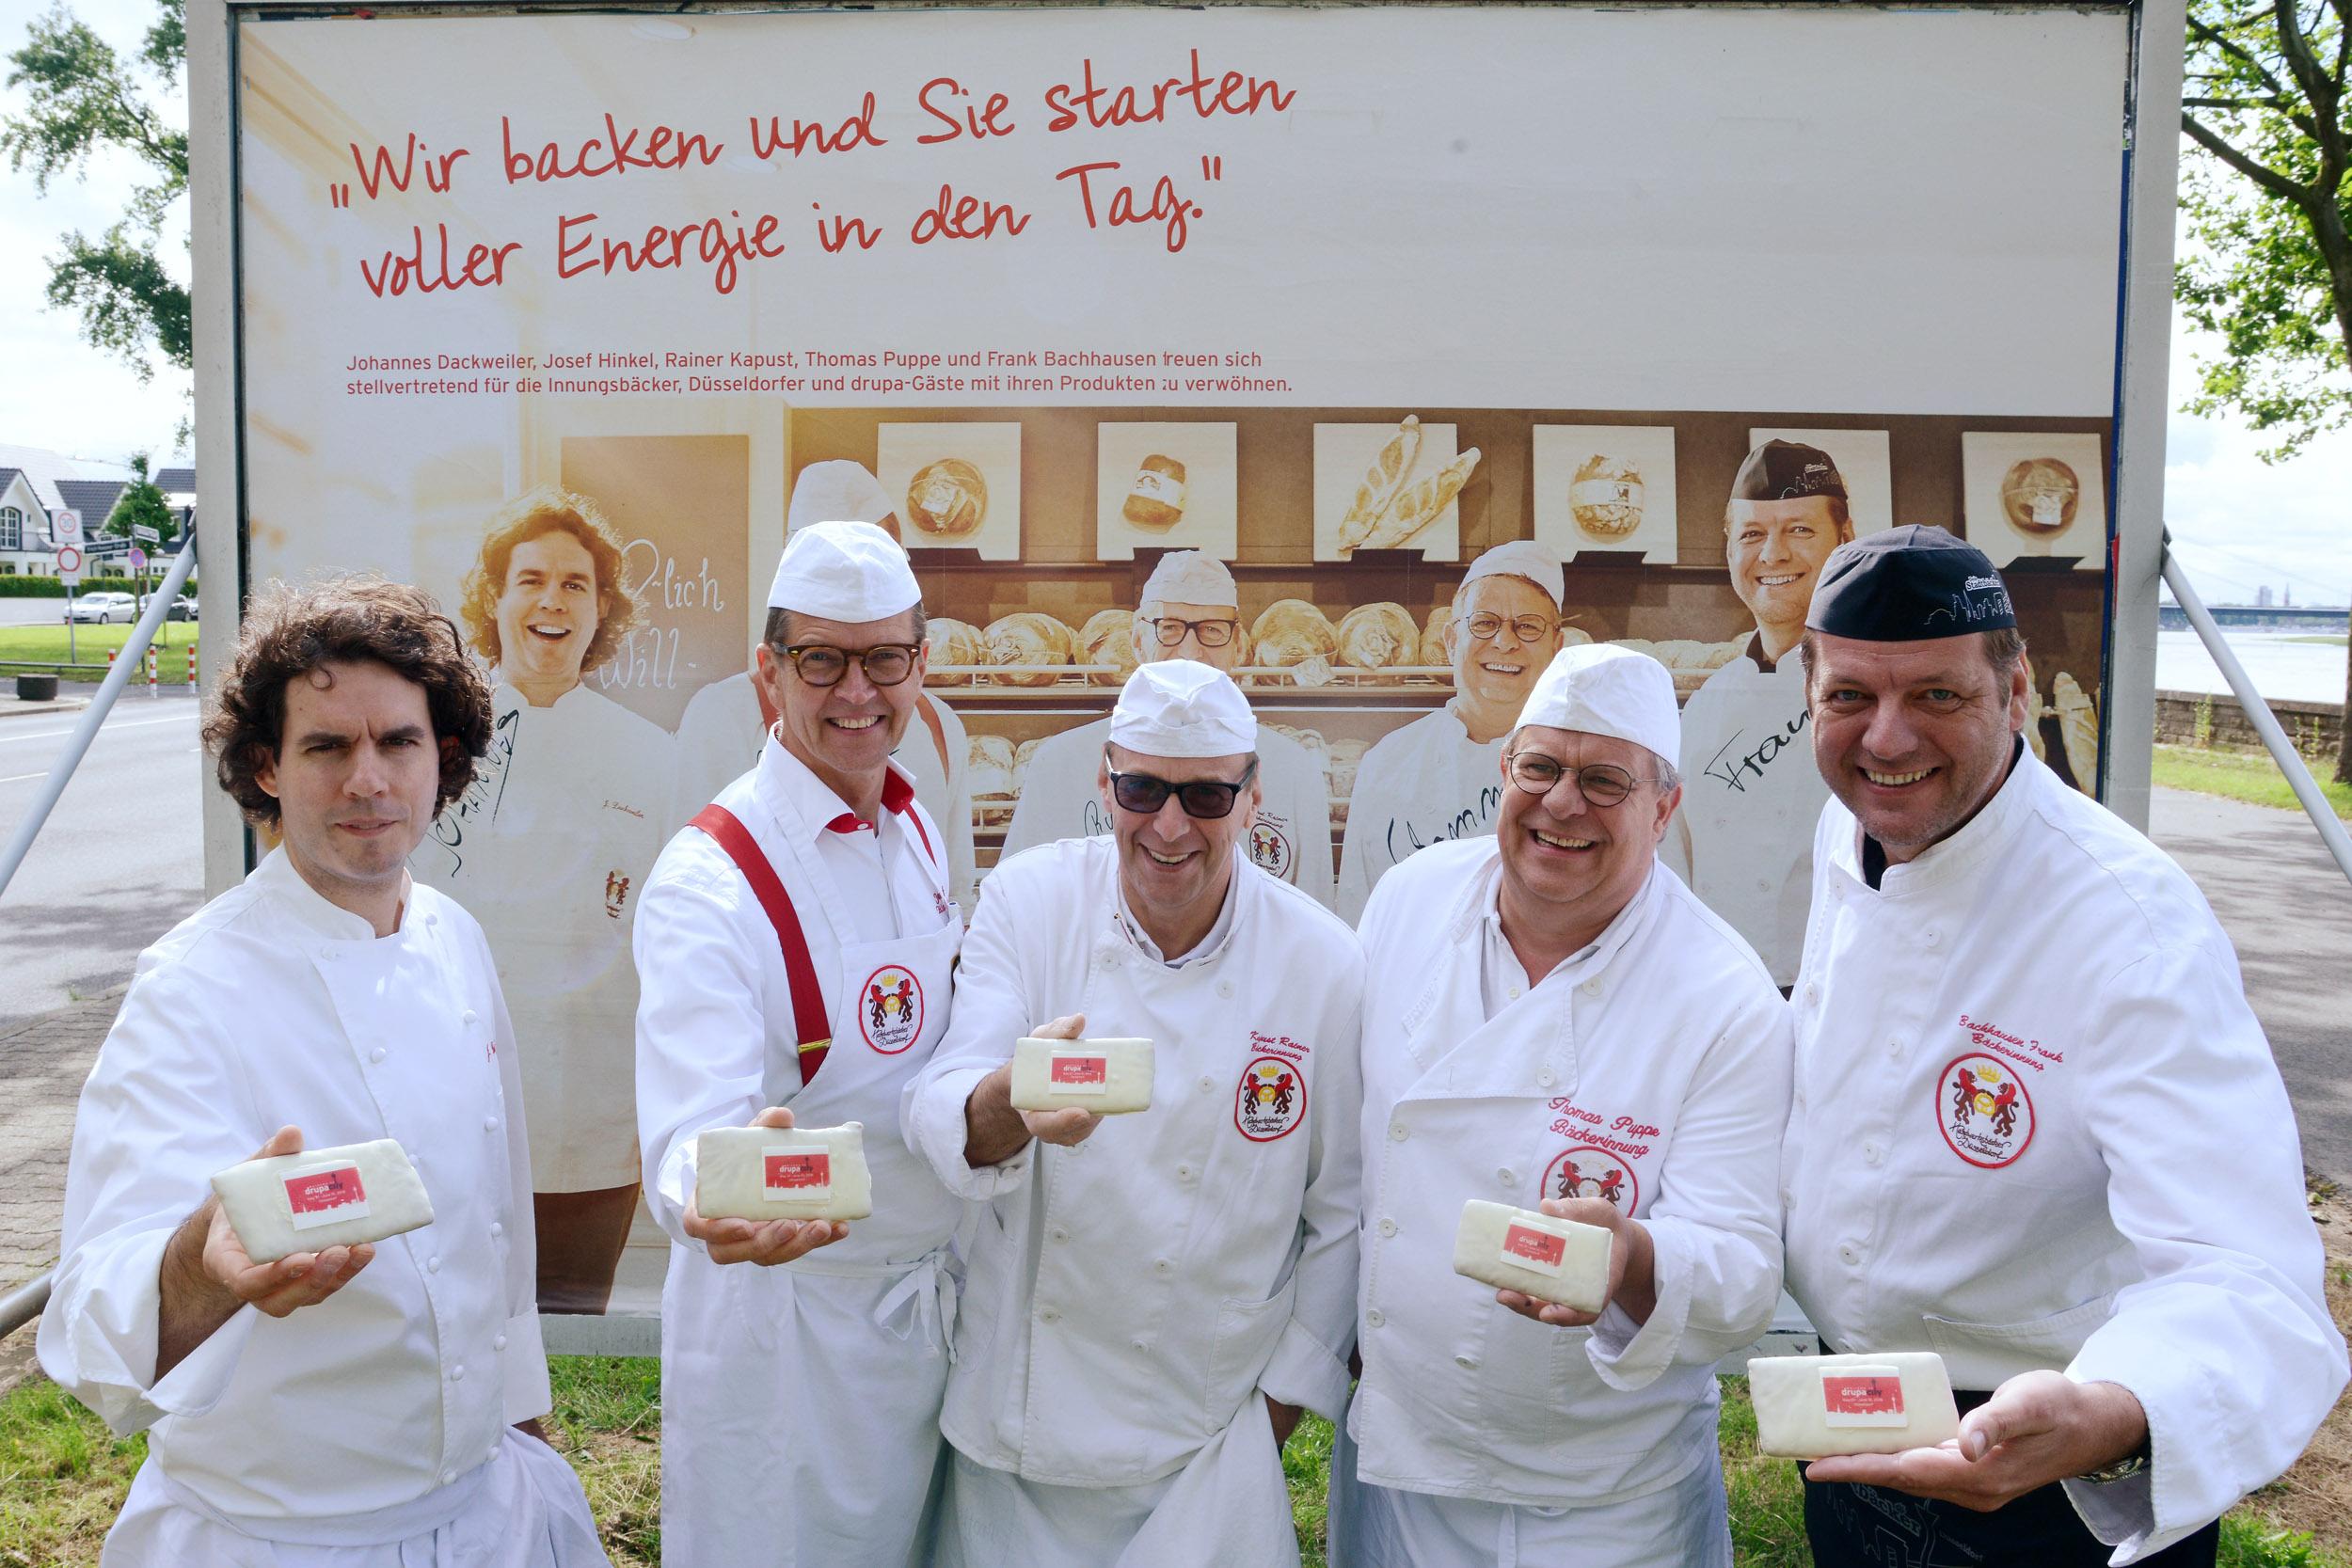 Johannes Dackweiler, Josef Hinkel, Rainer Kapust, Thomas Puppe und Frank Bachhausen (Foto: purfoto/Rolf Purpar)